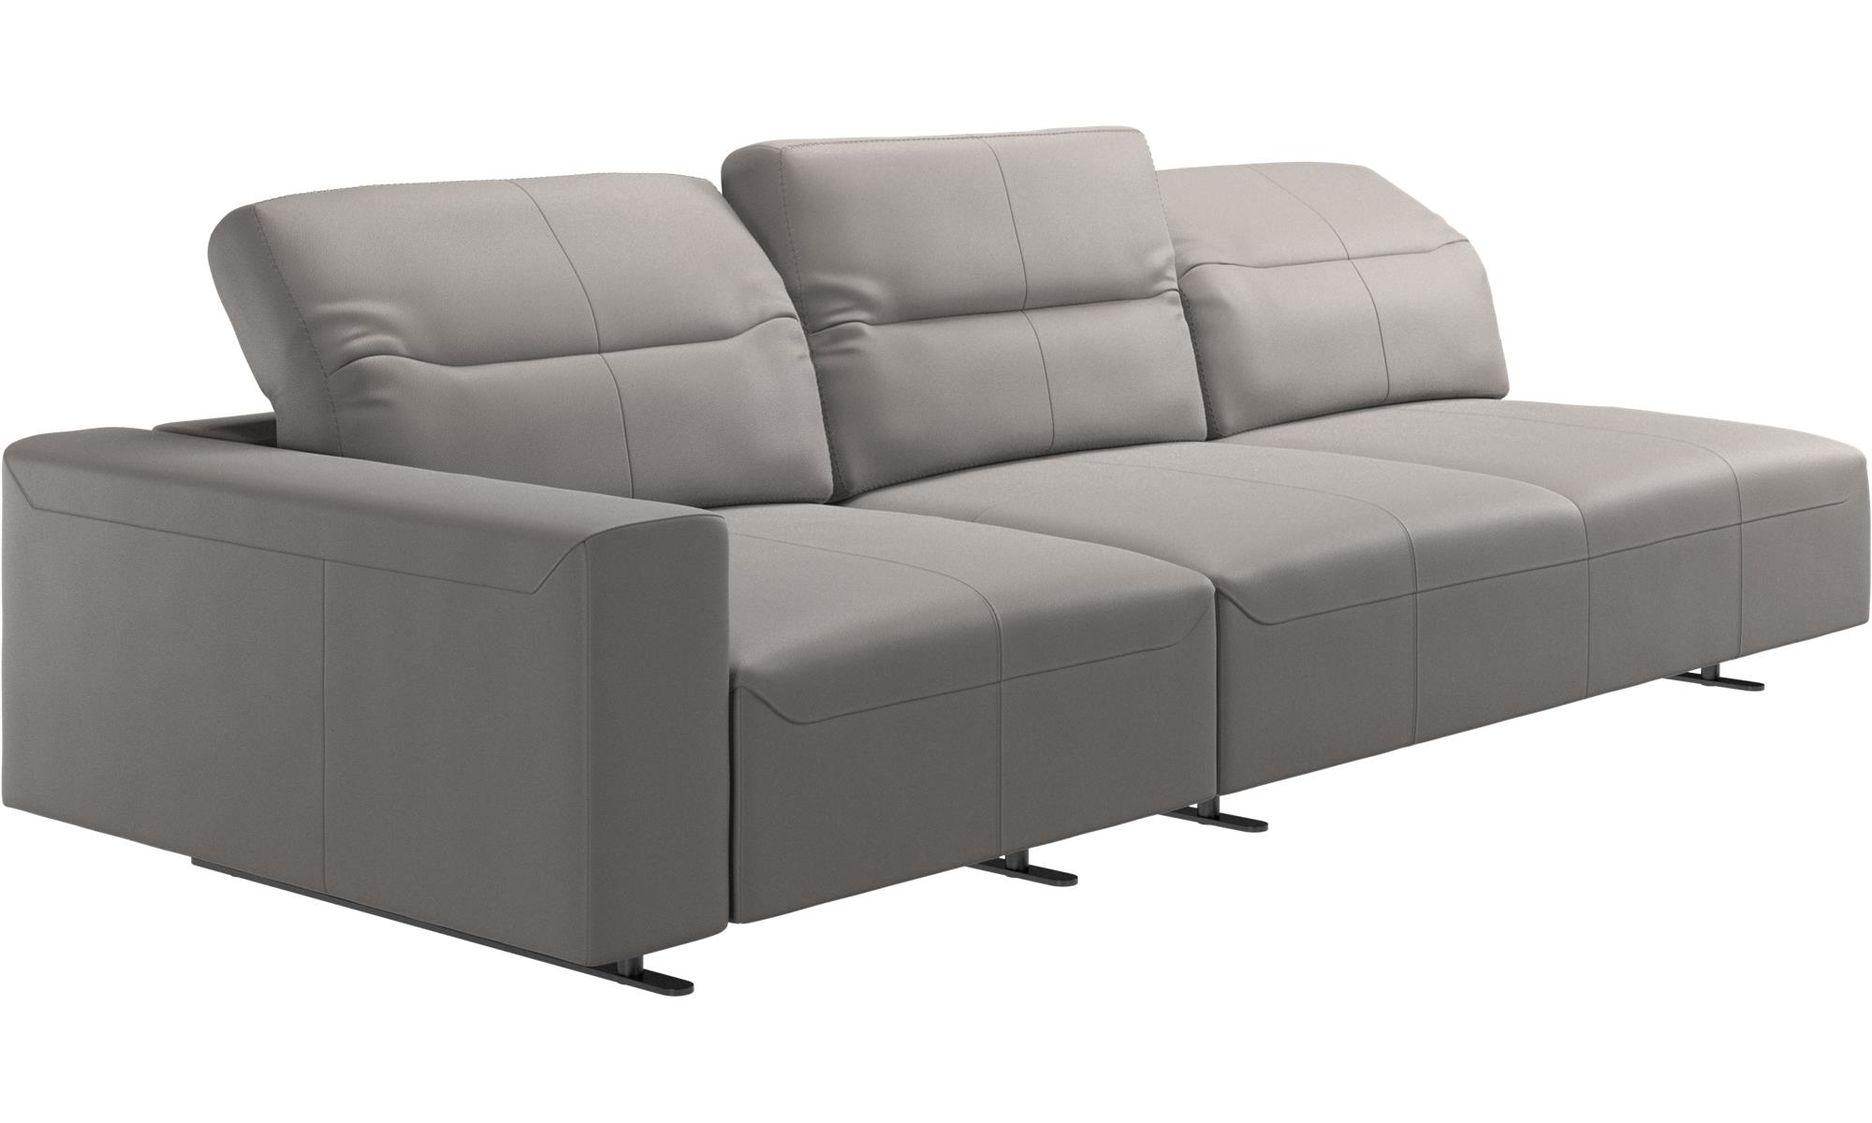 Latest Hampton Sofa With Adjustable Back – Goodglance Intended For Hamptons Sofas (View 3 of 15)